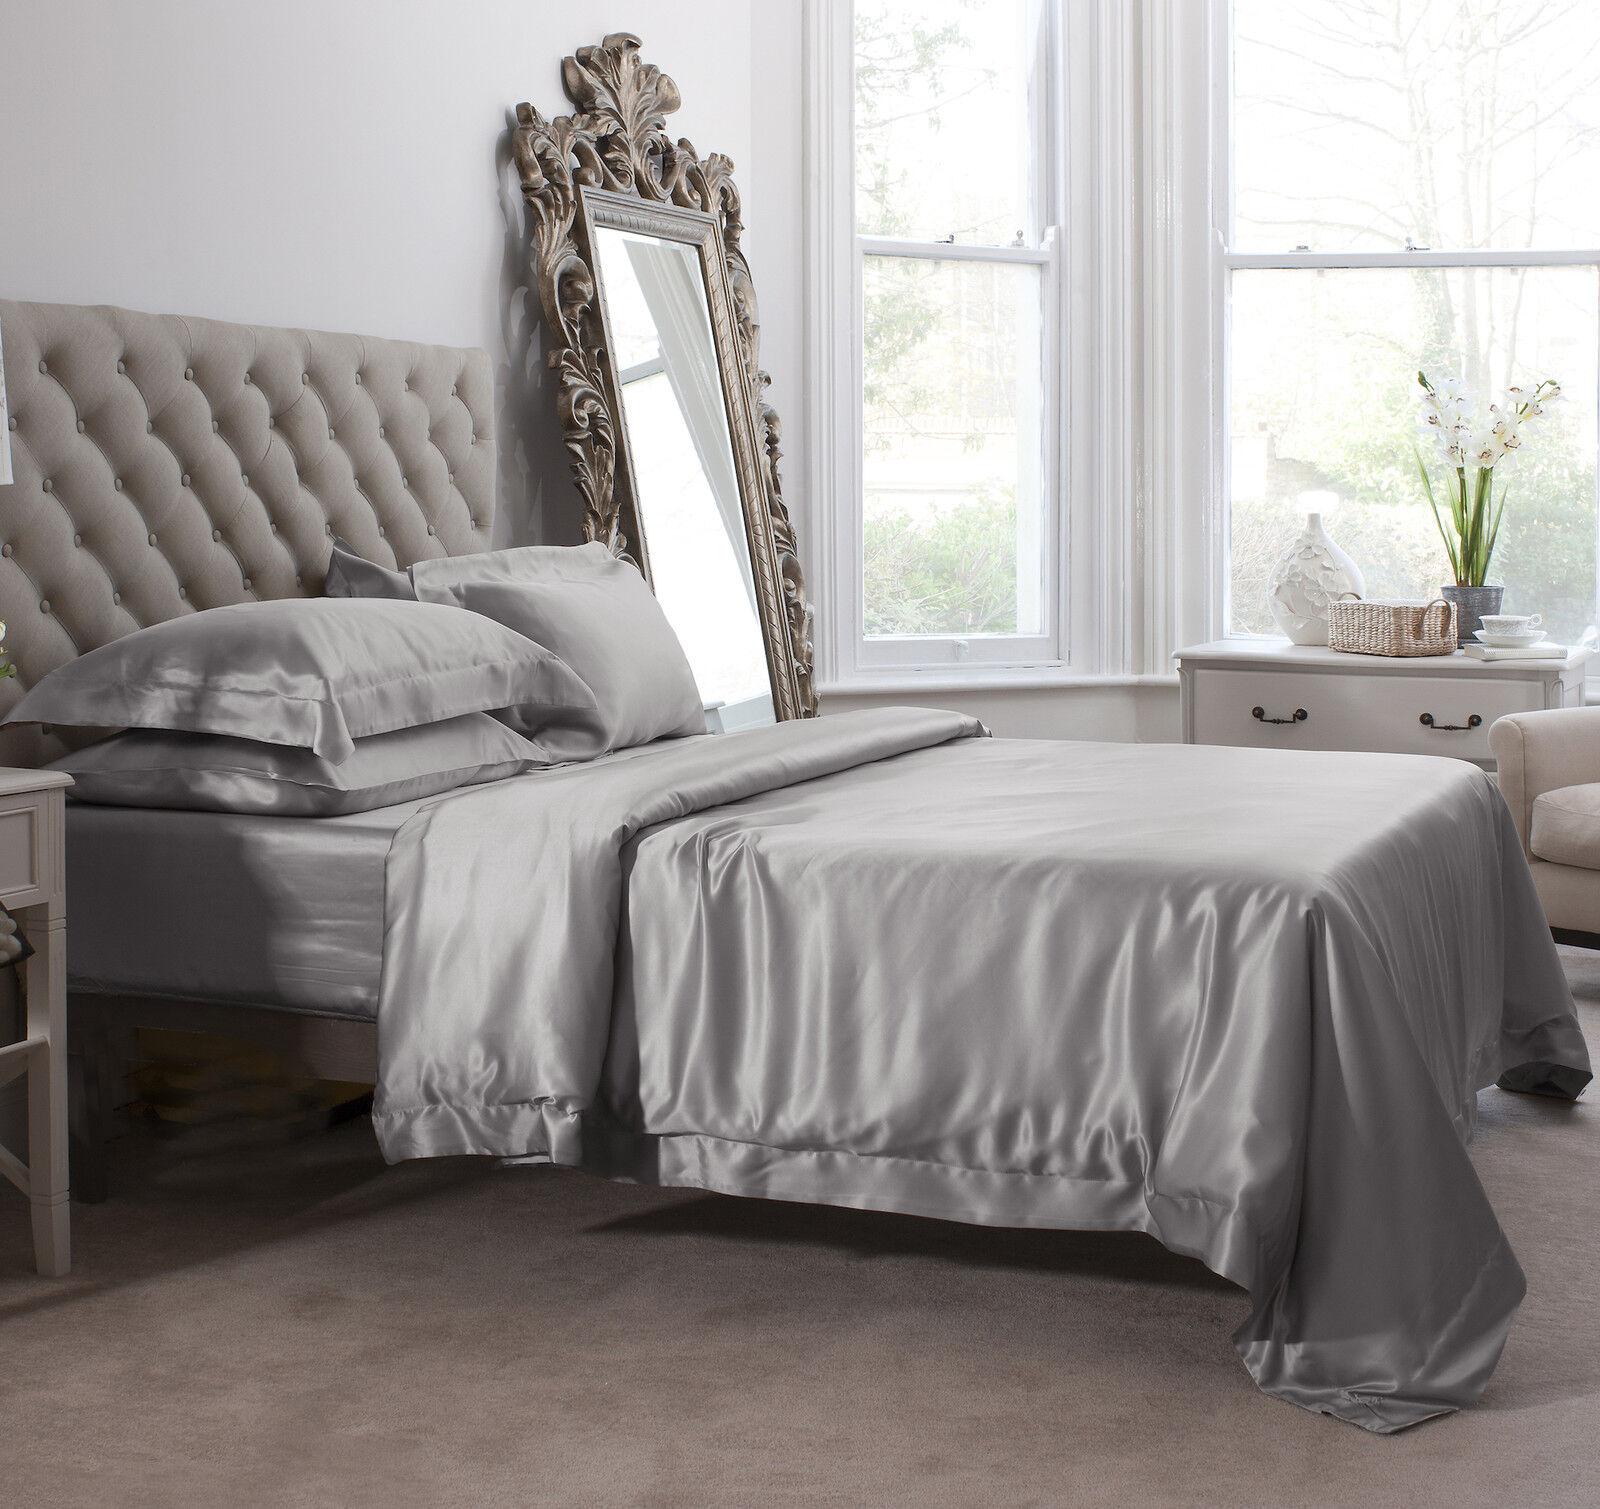 Jasmine Silk 6pcs 100% Charmeuse Seide Bettbezug Set Set Set grau King | Elegant Und Würdevoll  bae5cb